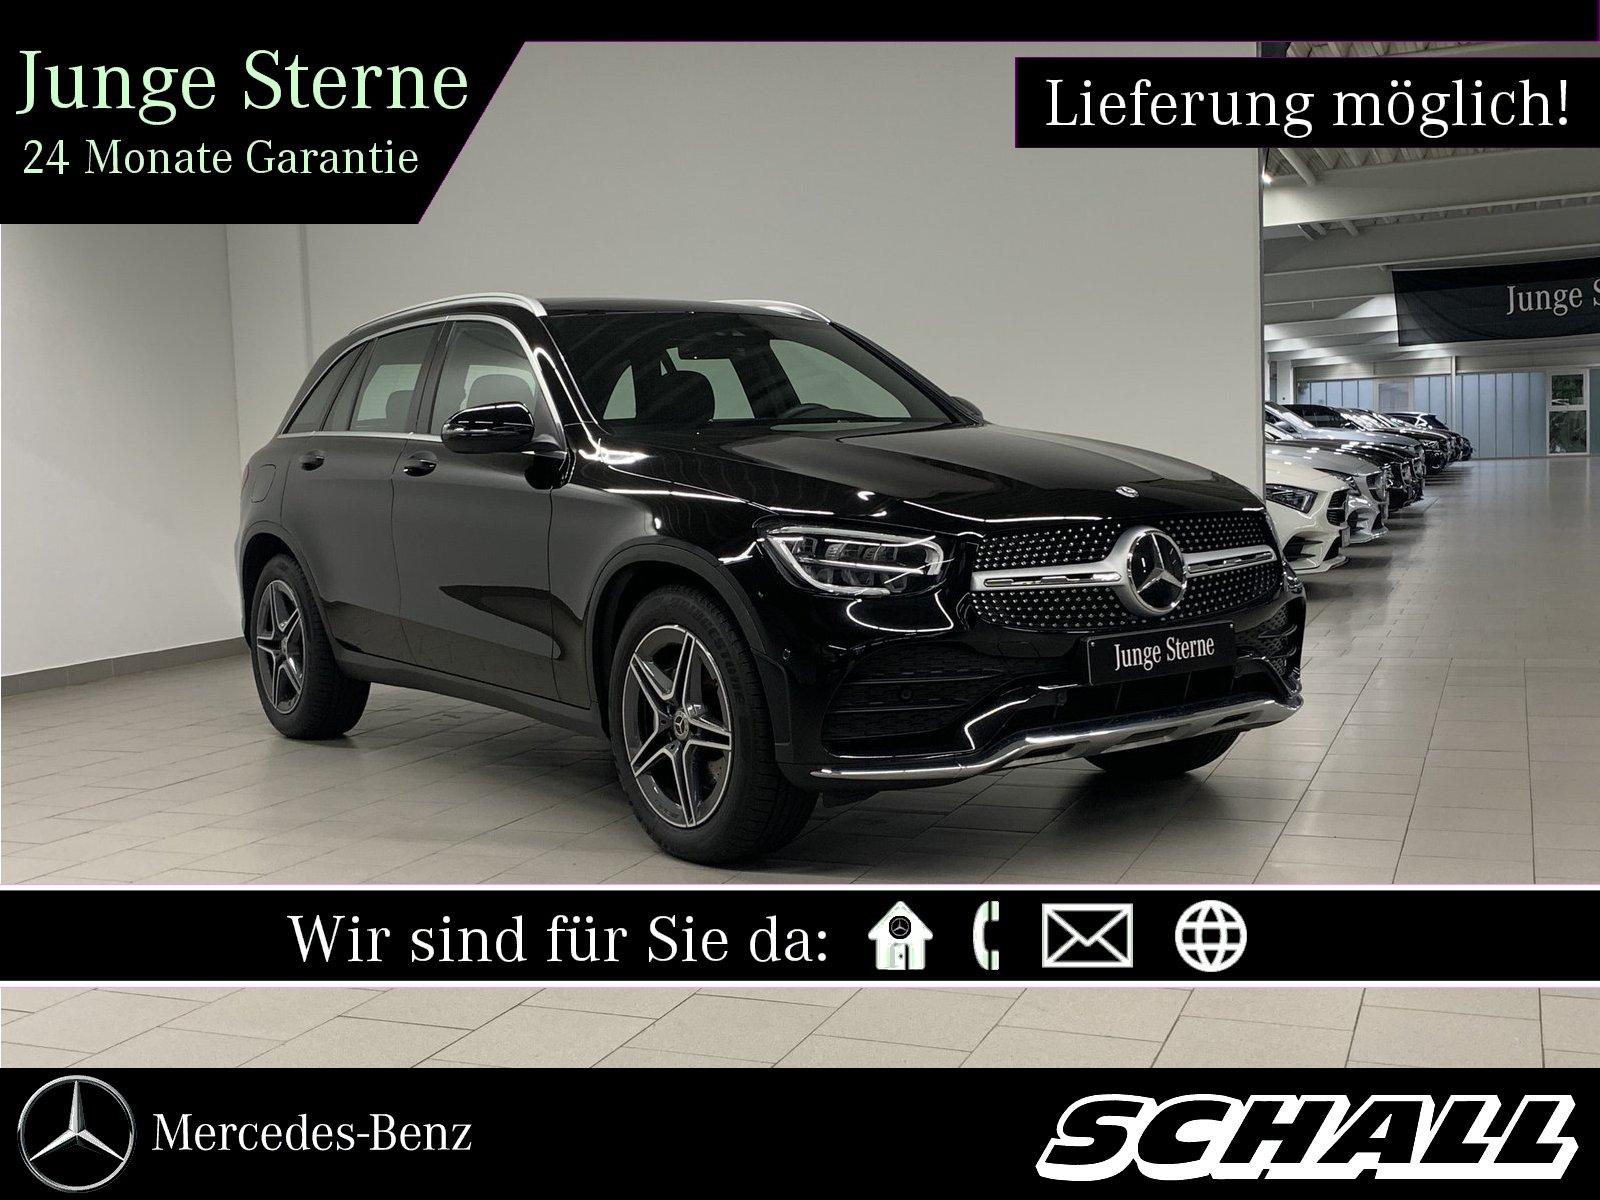 "Mercedes-Benz GLC 400 d 4M AMG+PANO+LED+NAVI+KAMERA+19""AMG, Jahr 2020, diesel"